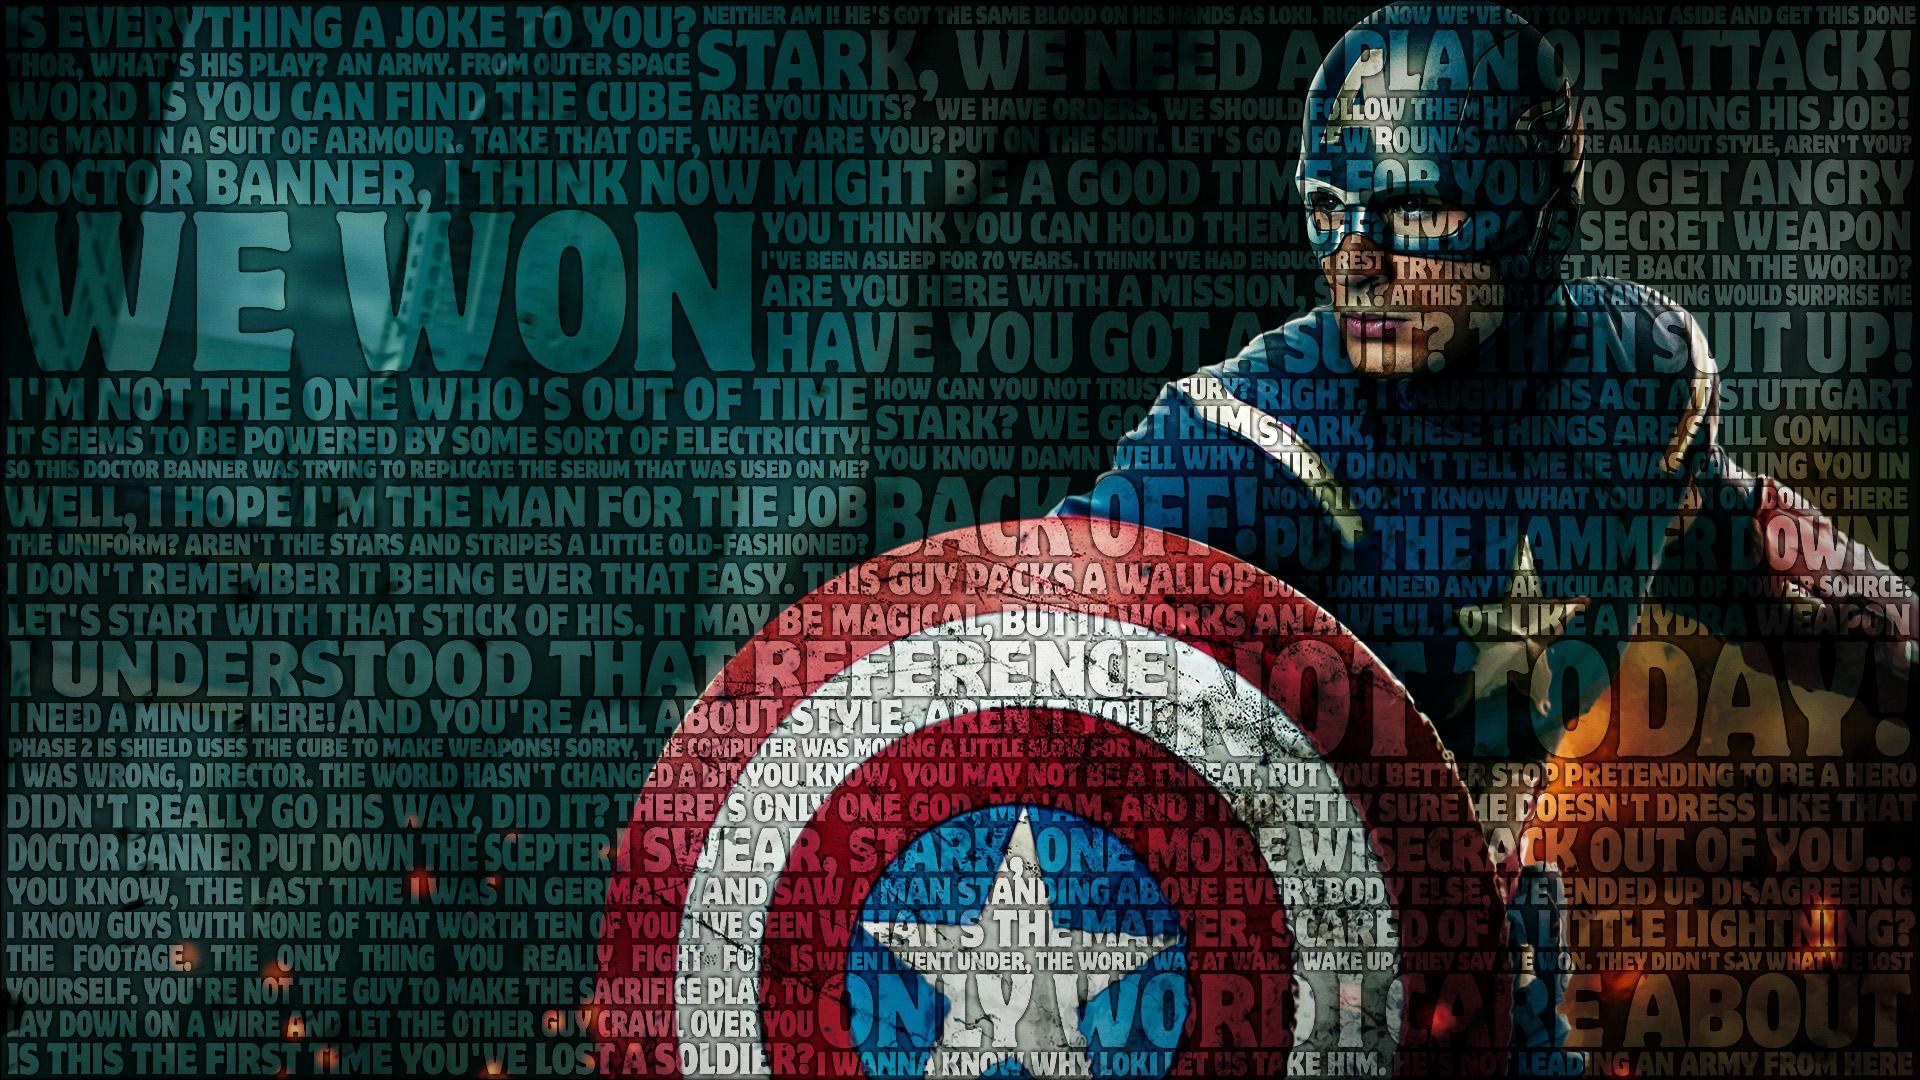 Captain America Avengers Typography Wallpaper